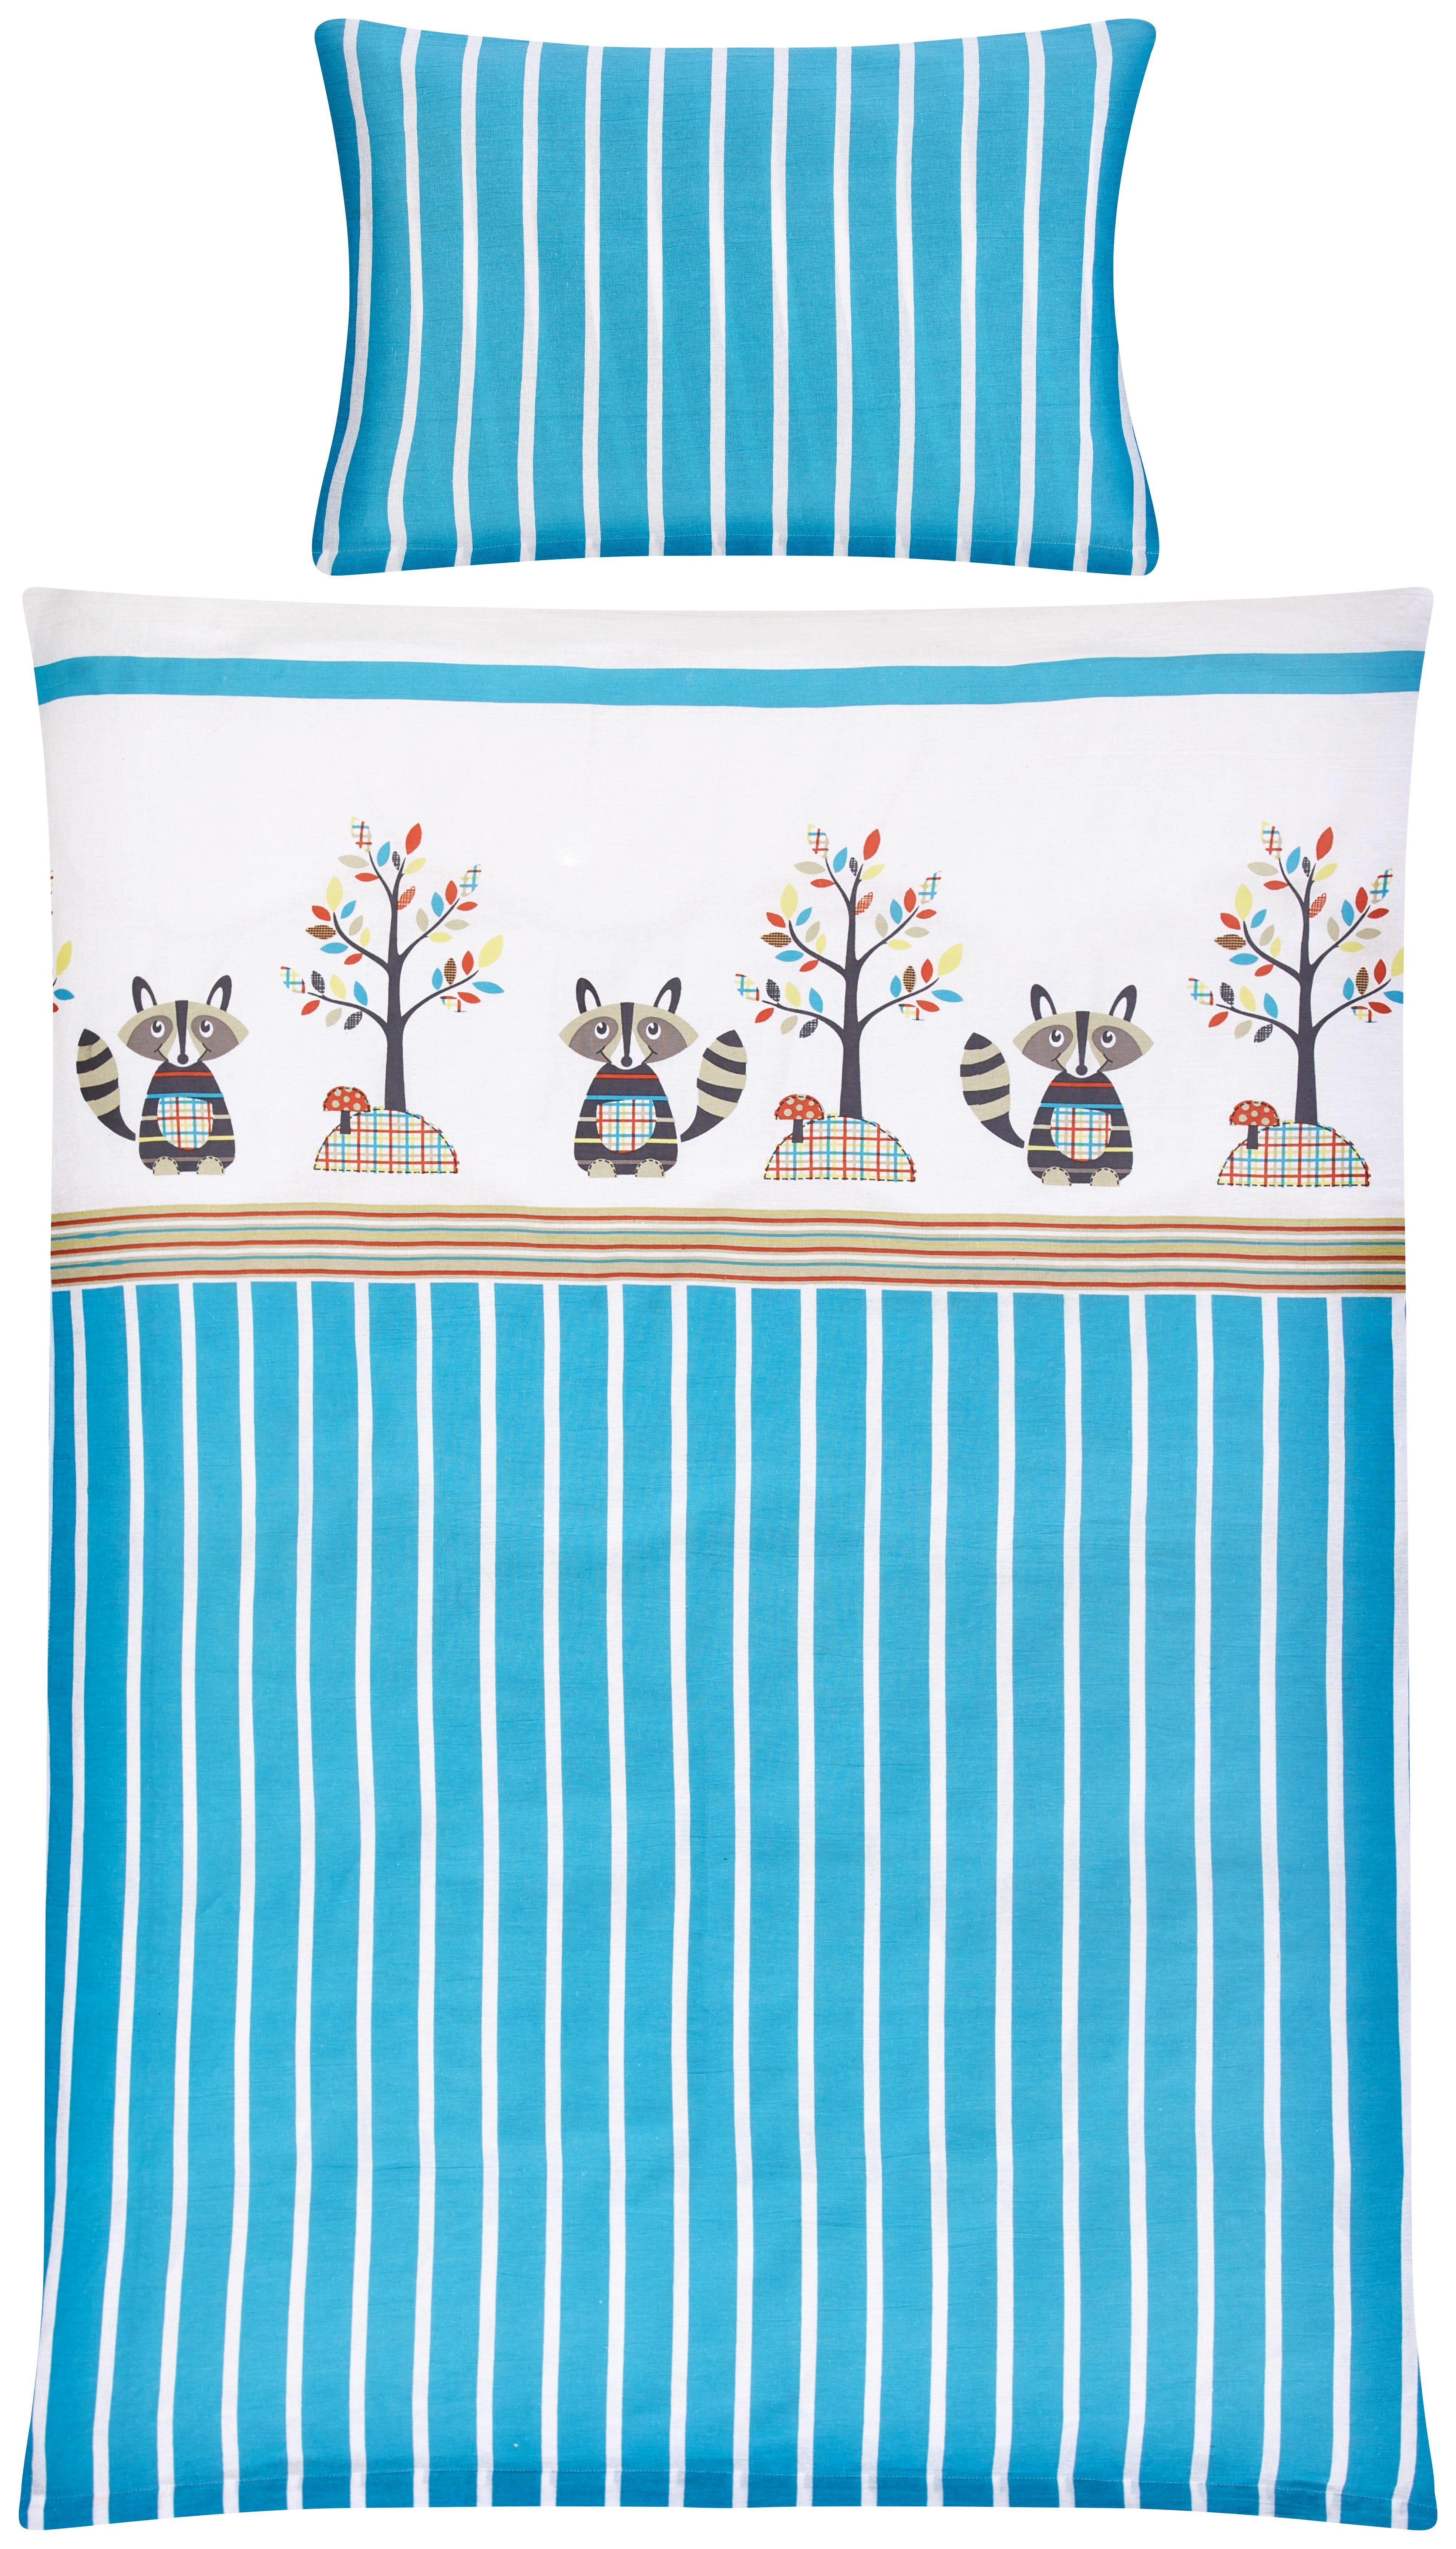 Kinderbettwäsche Andi ca. 100x135cm - Textil - MÖMAX modern living